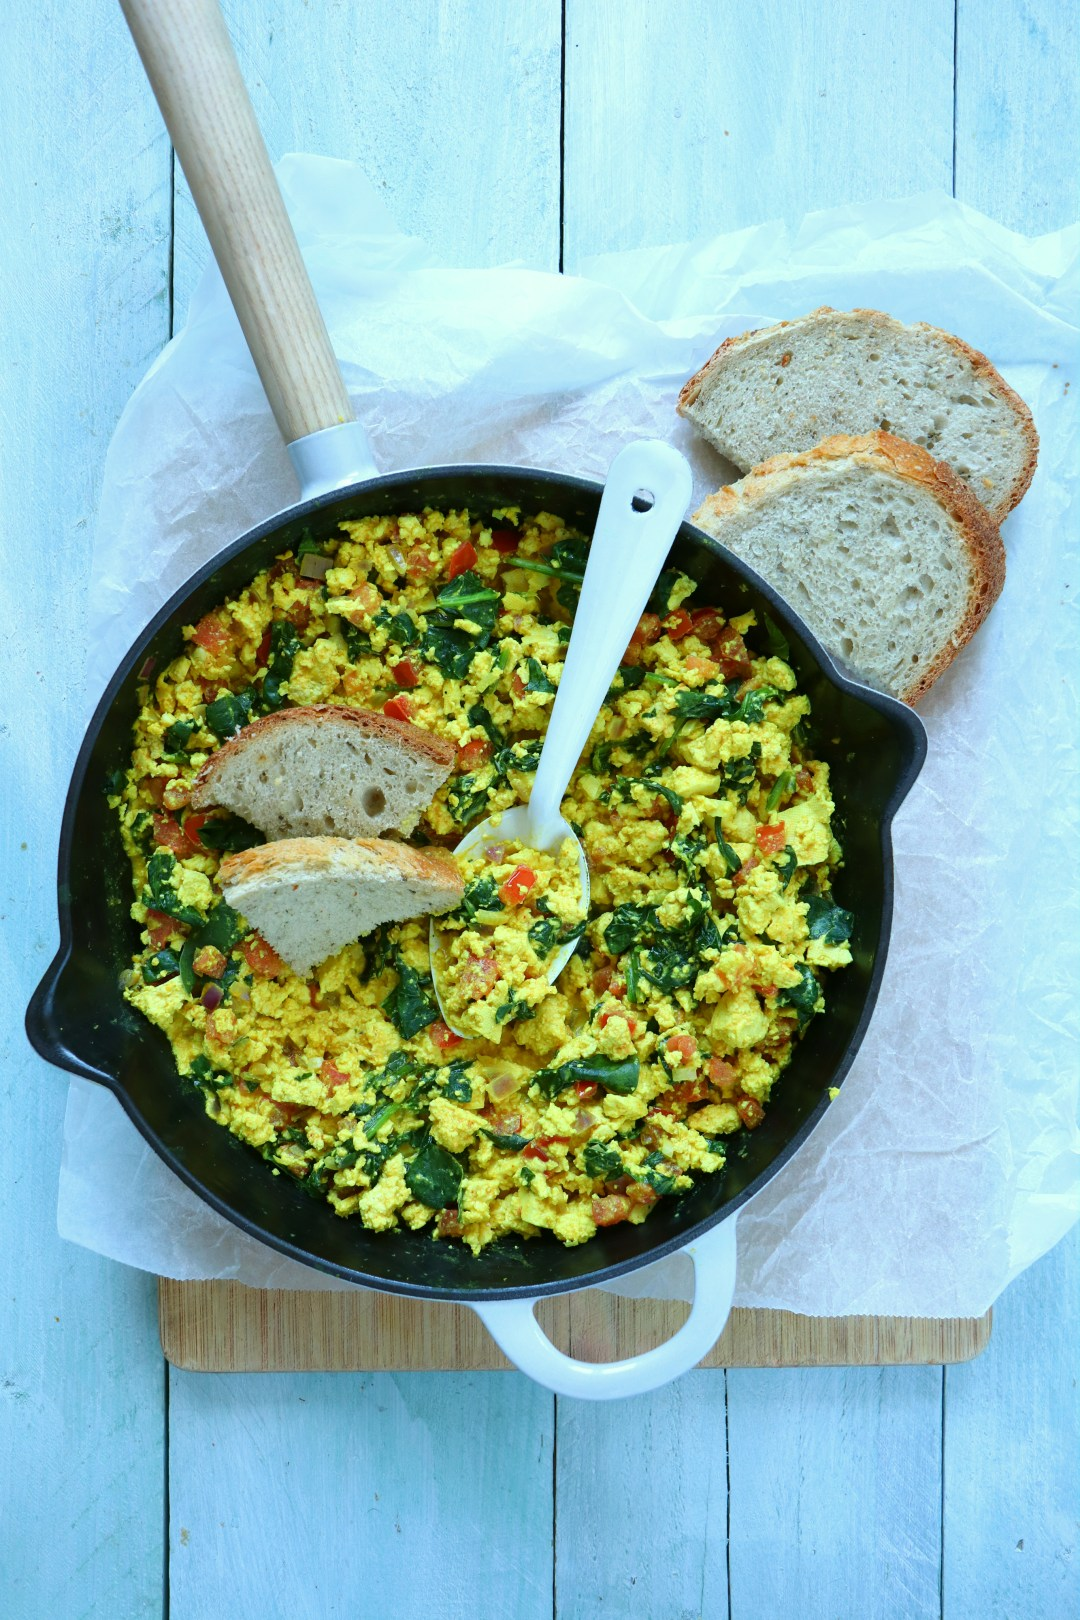 Recept vegan scrambled tofu met spinazie www.jaimyskitchen.nl